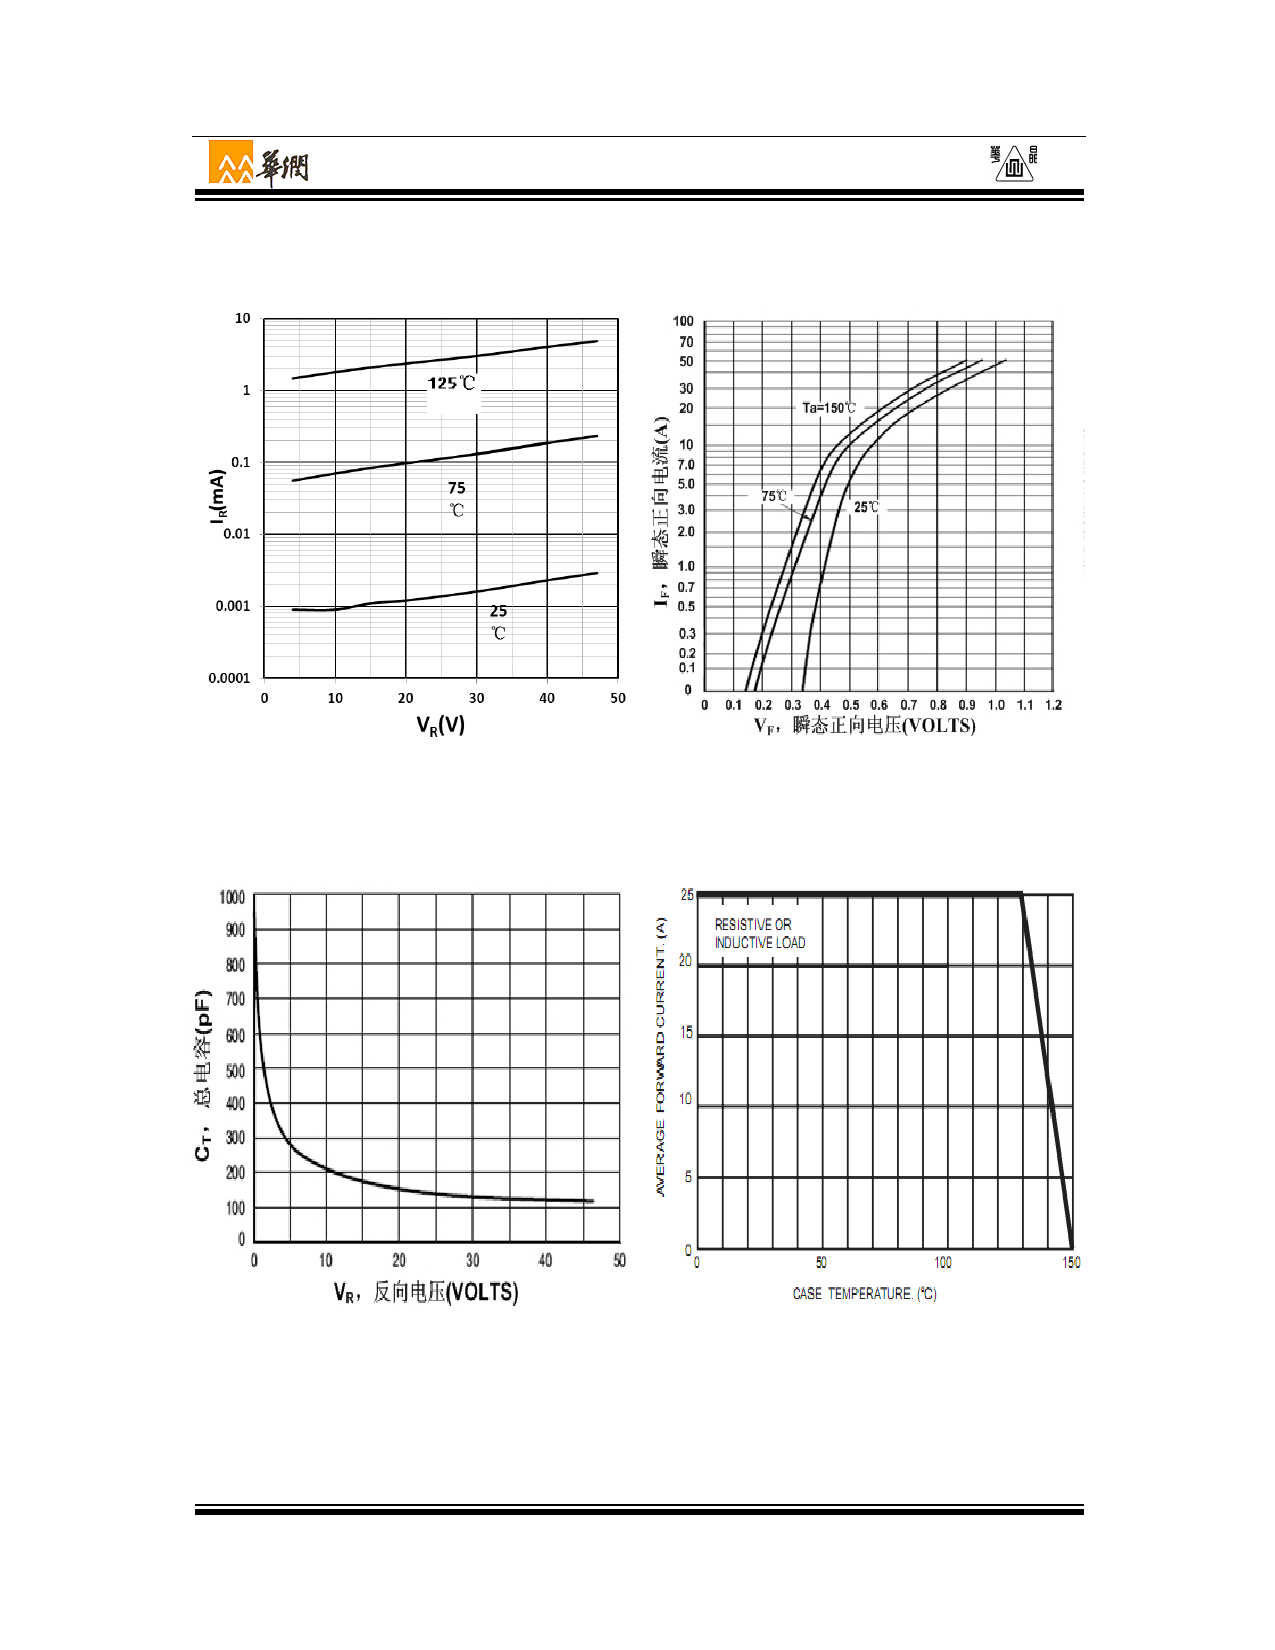 2CZ2545A9 pdf, ピン配列